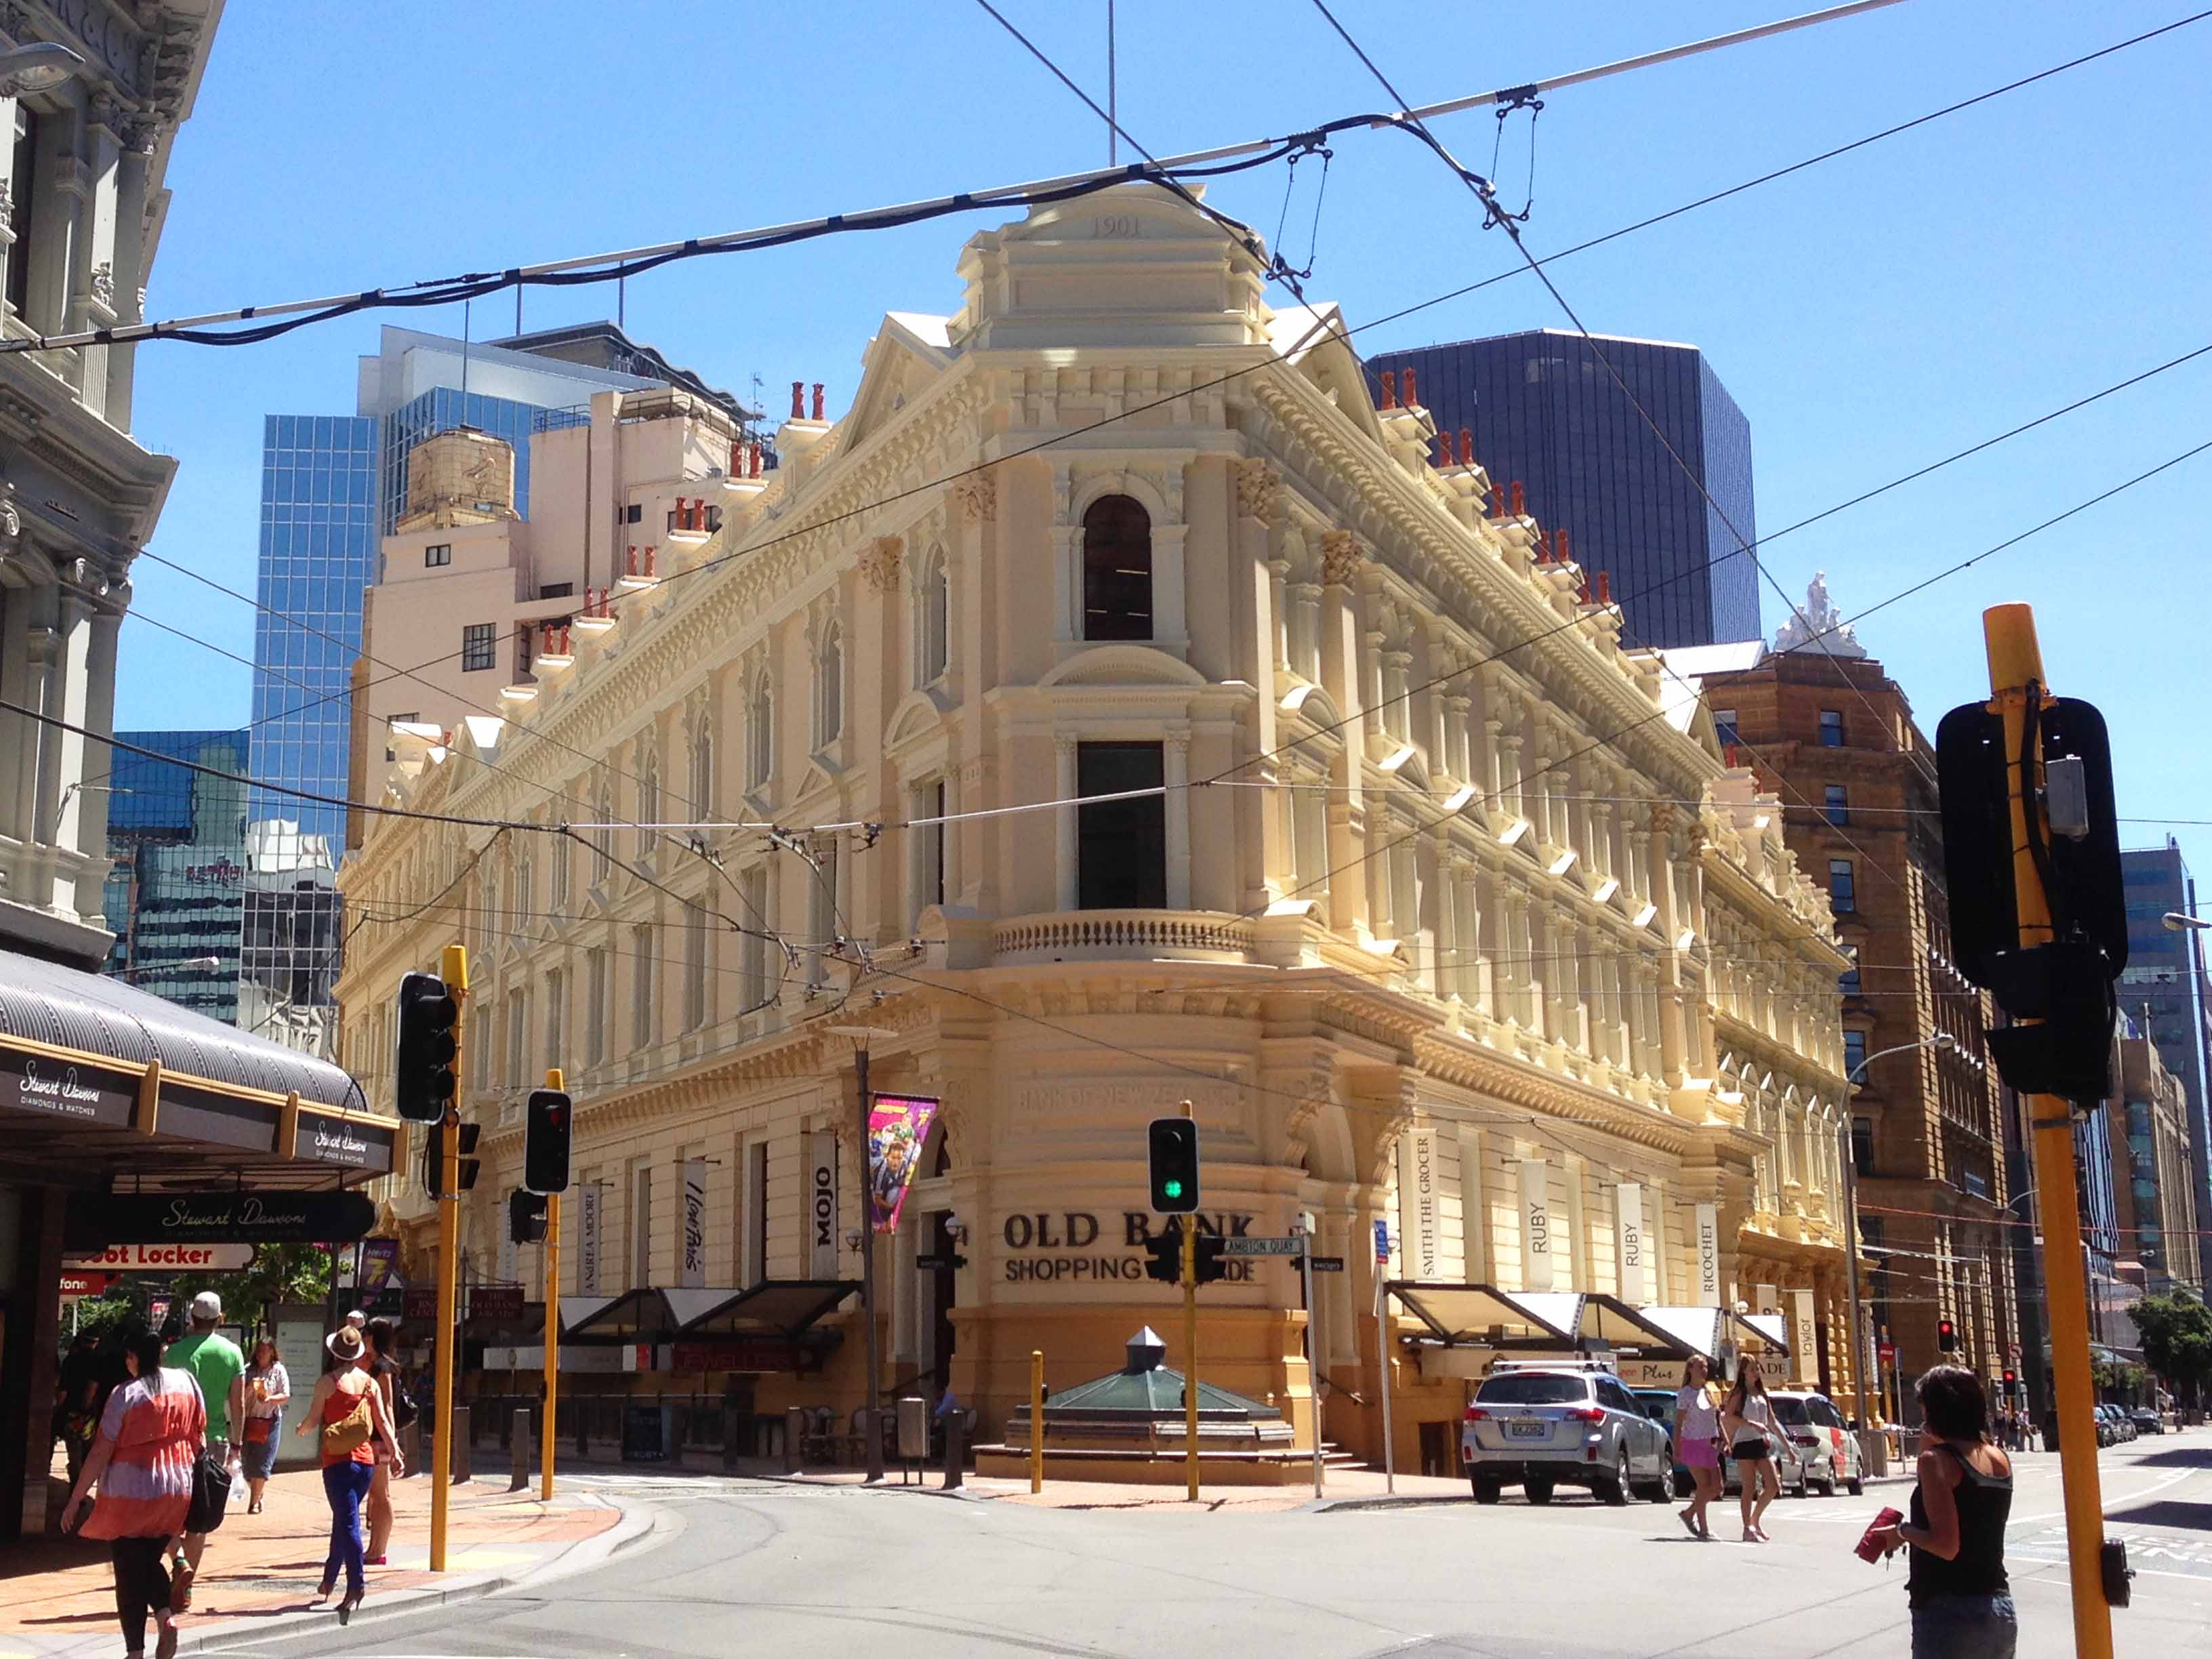 Neuseeland Old Bank